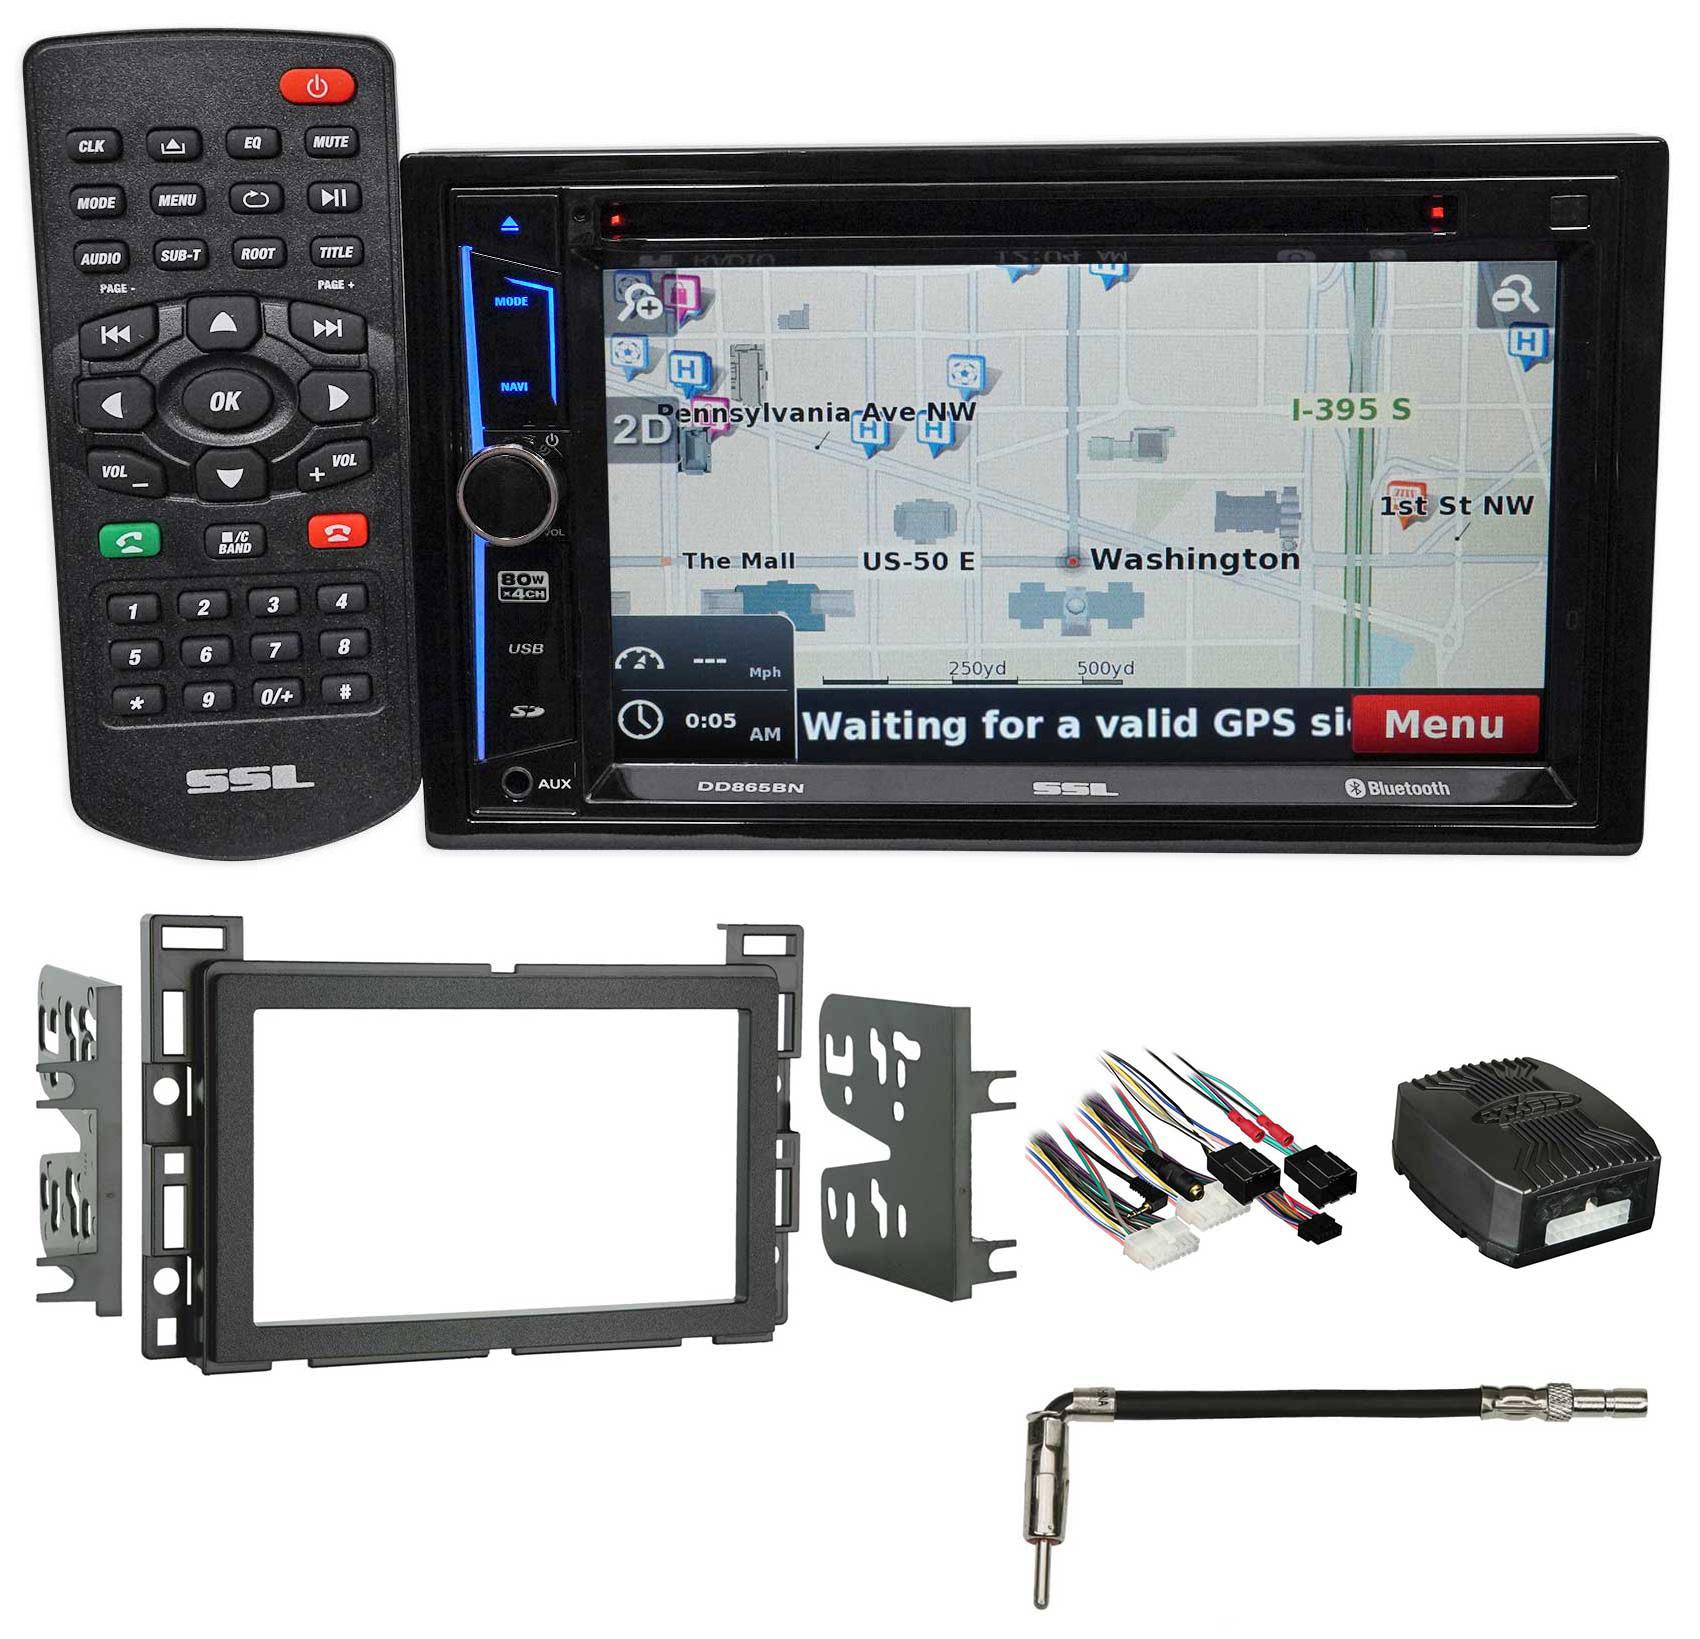 2009 Pontiac G6 Navigation/GPS/DVD Receiver Monitor Bluet...